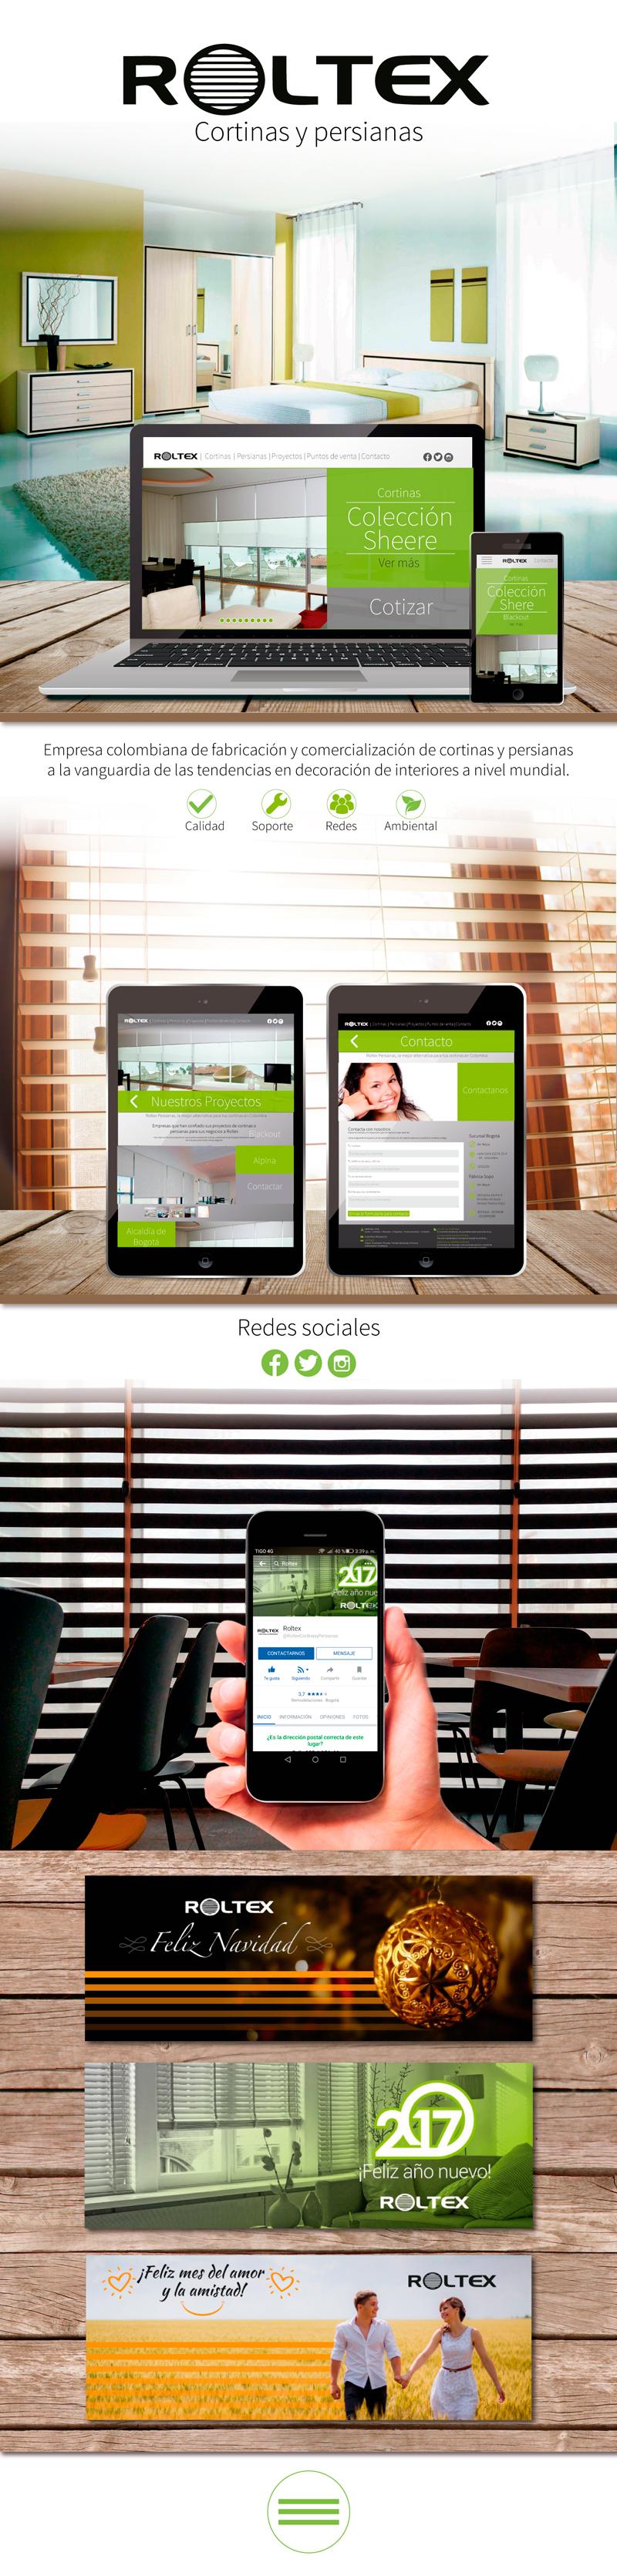 Roltex - Diseño Web - Social Media - Marketing Web